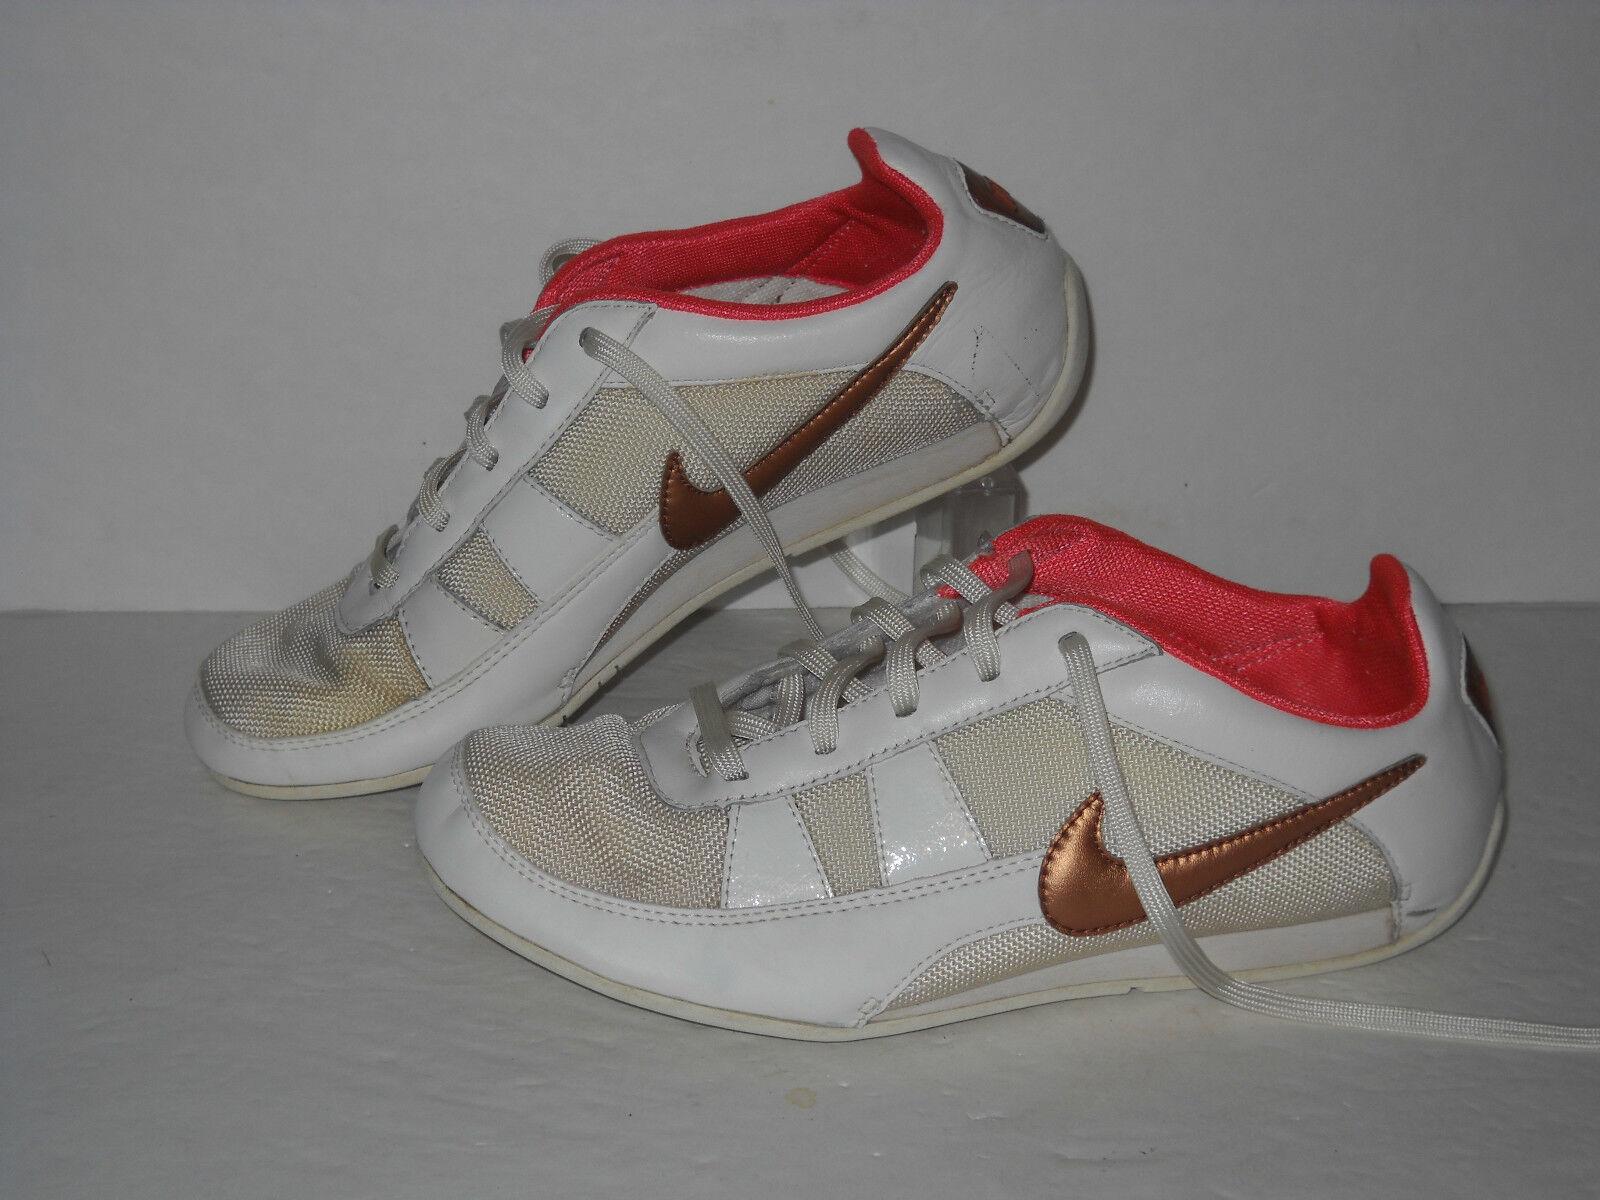 Nike Shoes, Training Shoes, Nike White/Bronze/Pink, Womens US Size 6.5 77e842